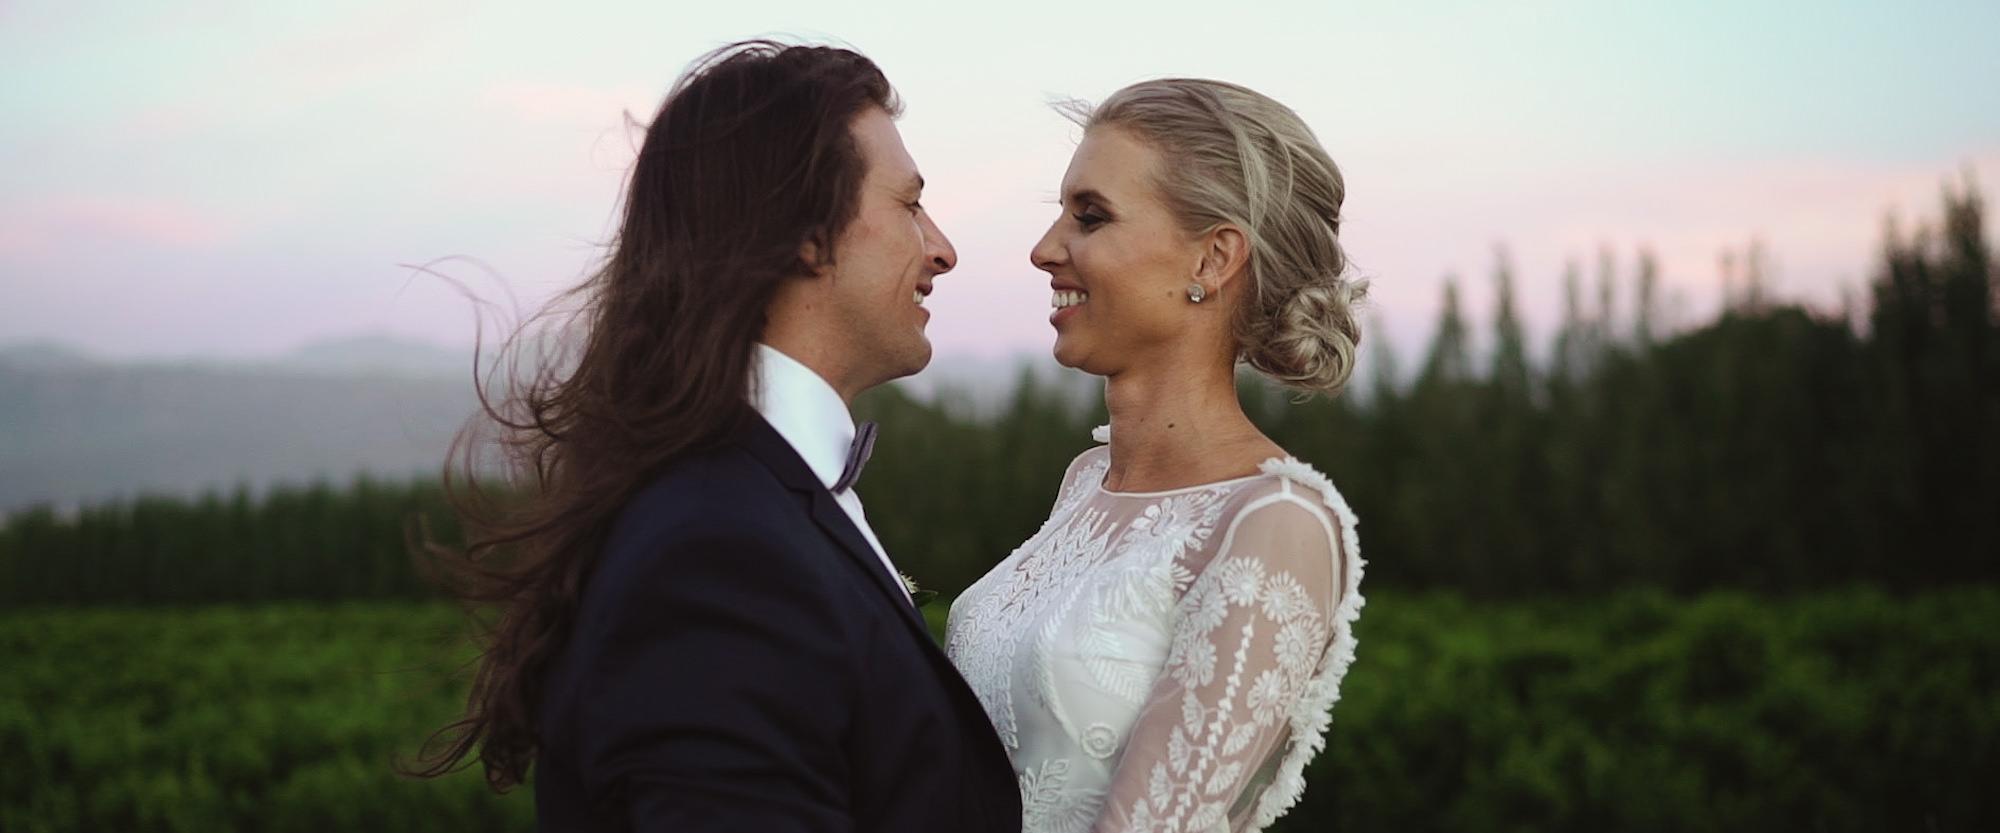 HeathEmelieWeddingFilm_Babylonstoren_Wedding_4.jpg